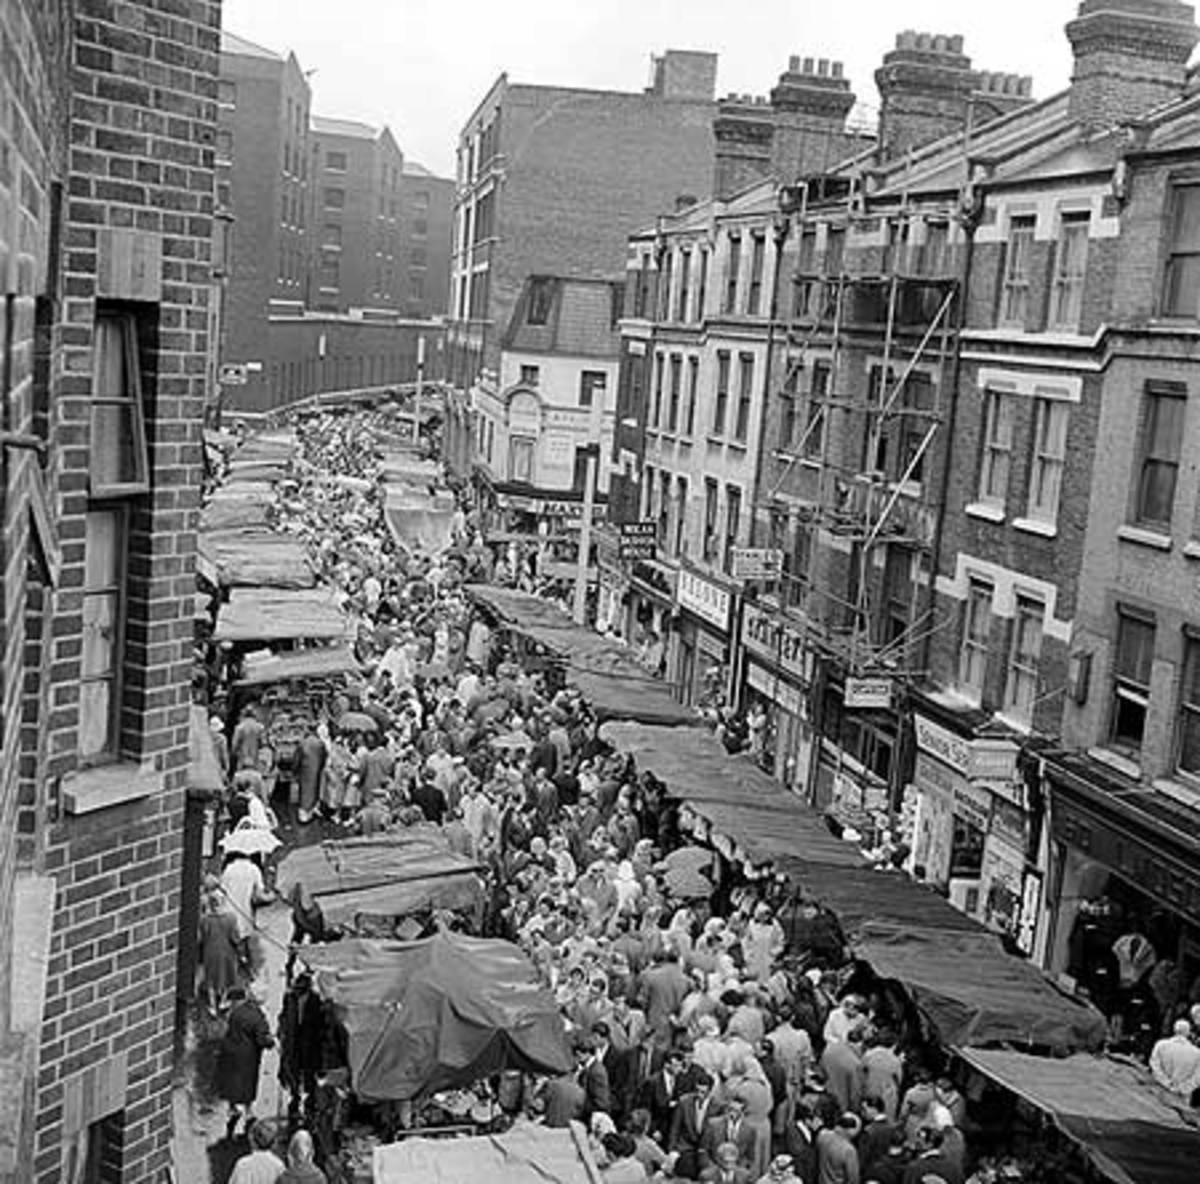 Pettycoat Lane Market